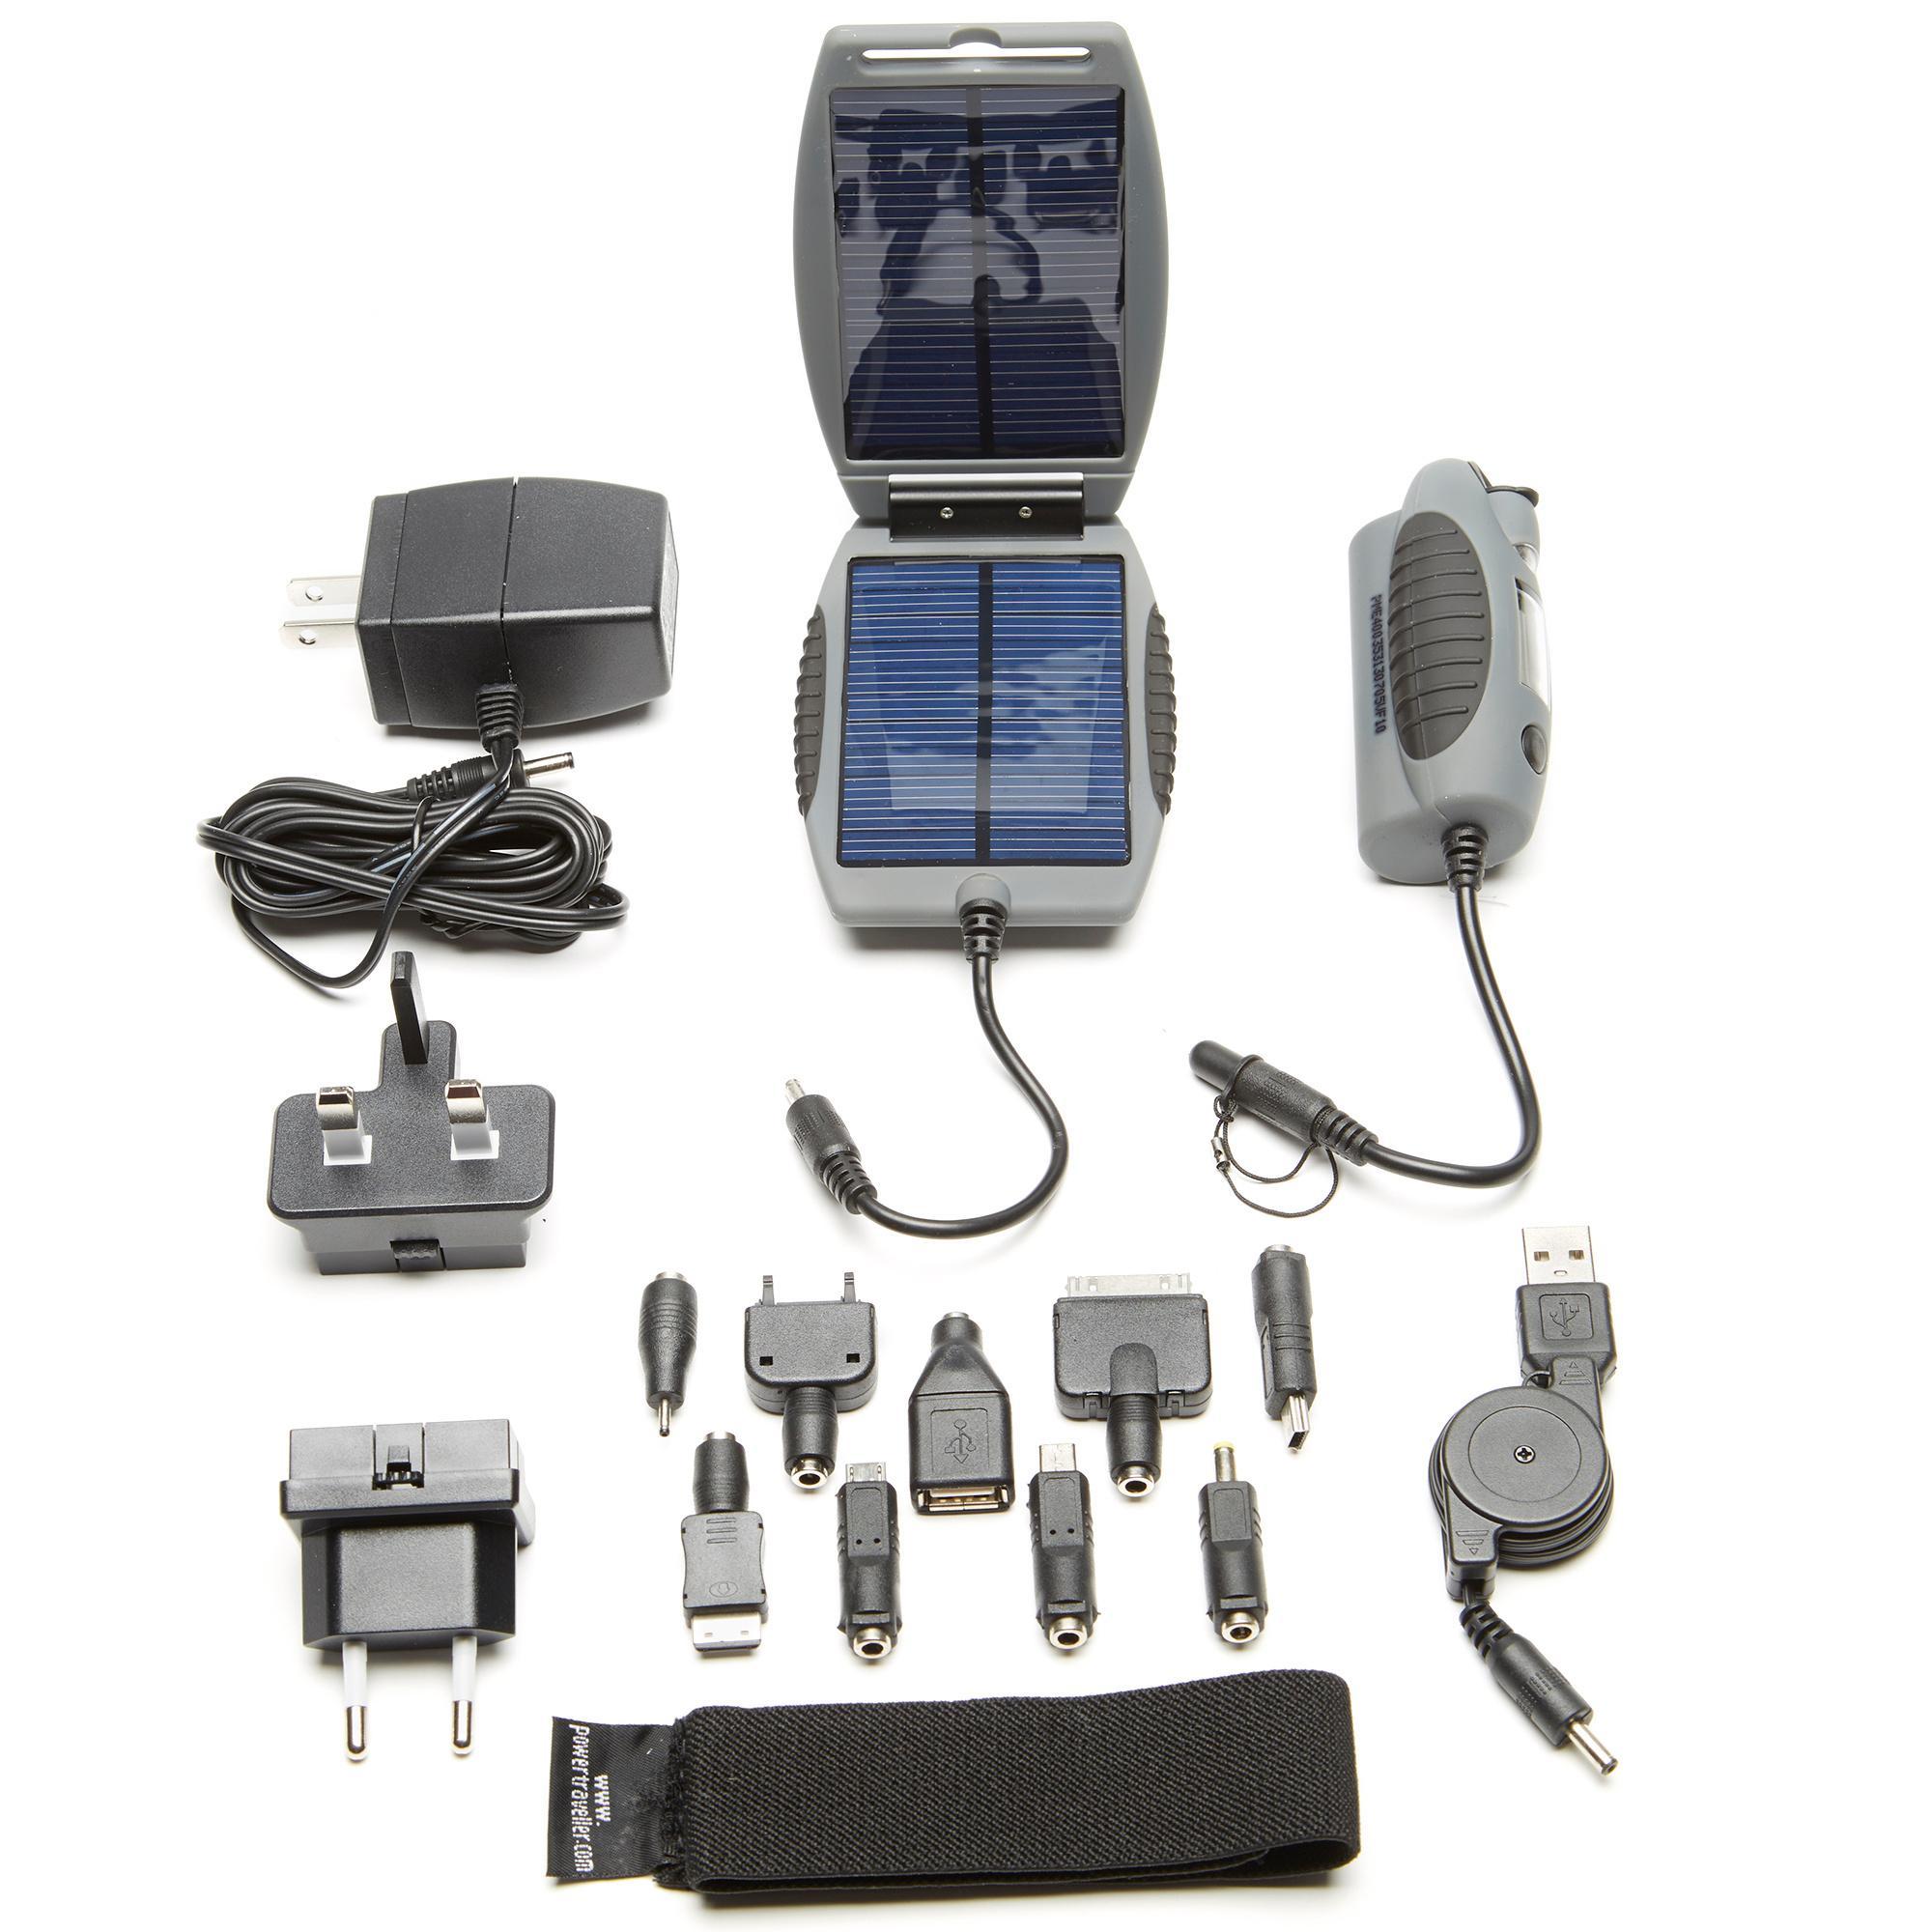 Powertraveller PowerMonkey Explorer Solar Charger